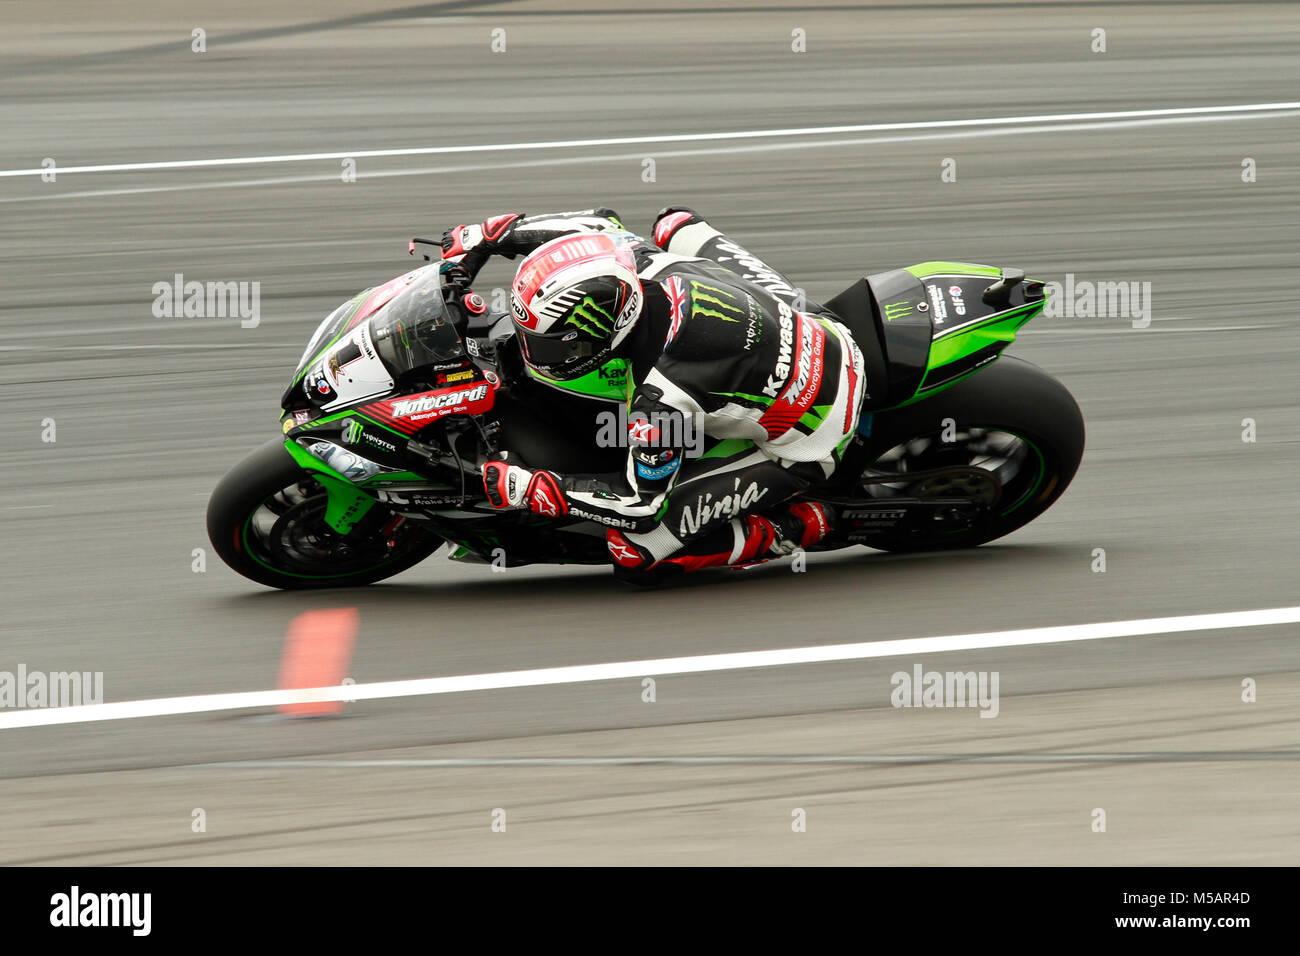 Jonathan Rea (GBR) of Kawasaki Racing Team during 2017 MOTUL FIM Superbike World Championship, Prosecco DOC German - Stock Image